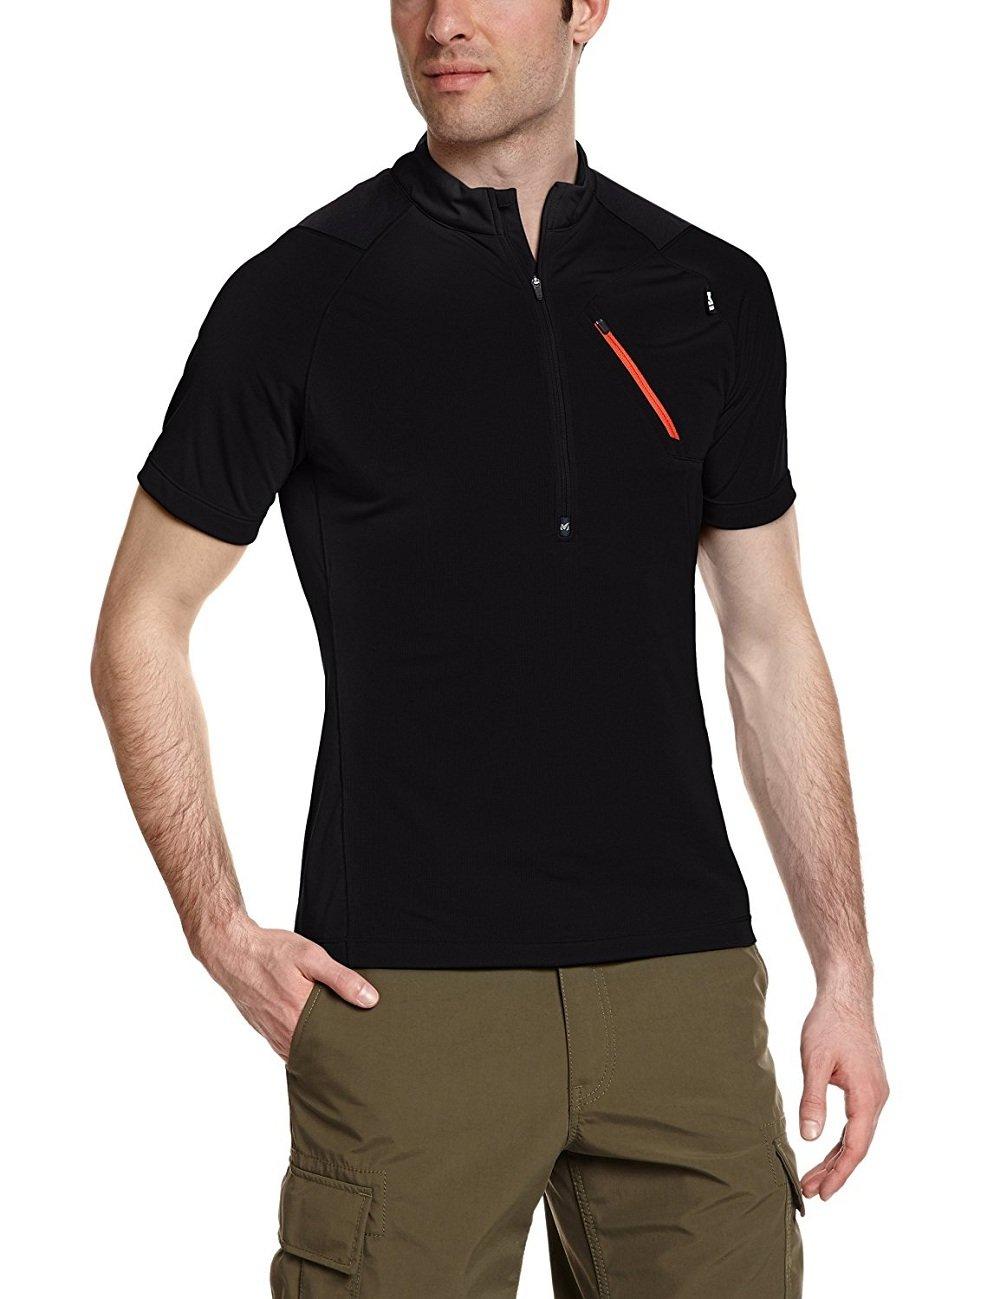 MILLET ROT Needles Shirt Zip Kurzärmelig